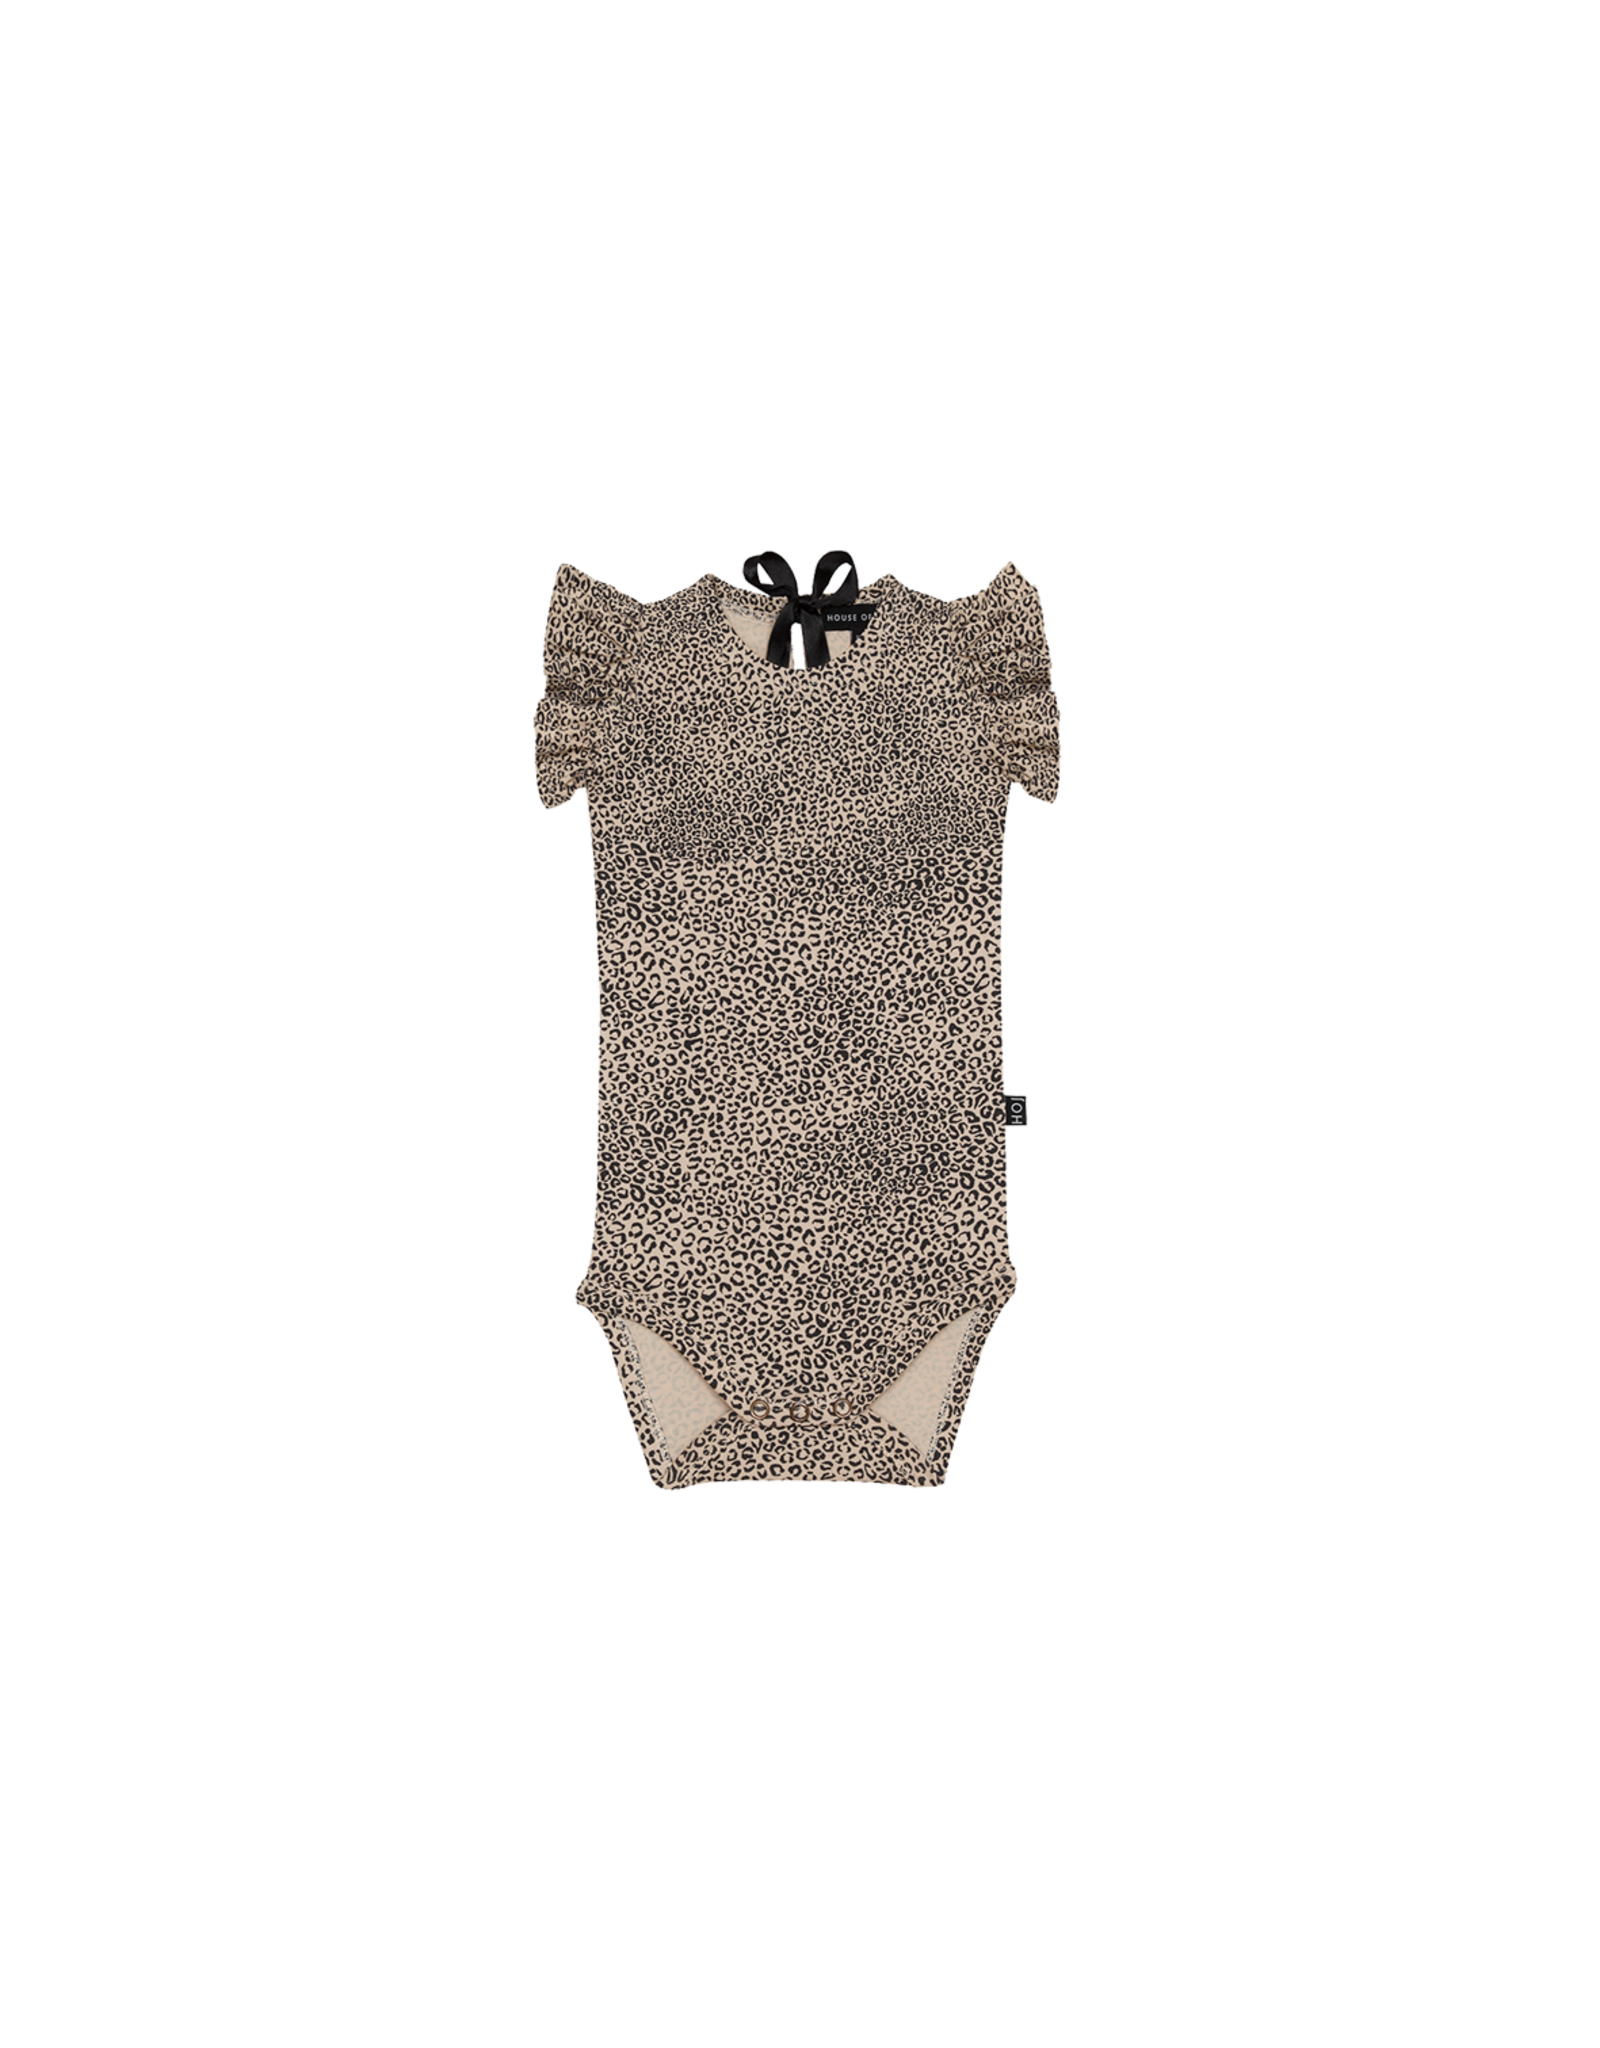 House of Jamie HOJ Ruffled Bodysuit Charcoal Little Leopard